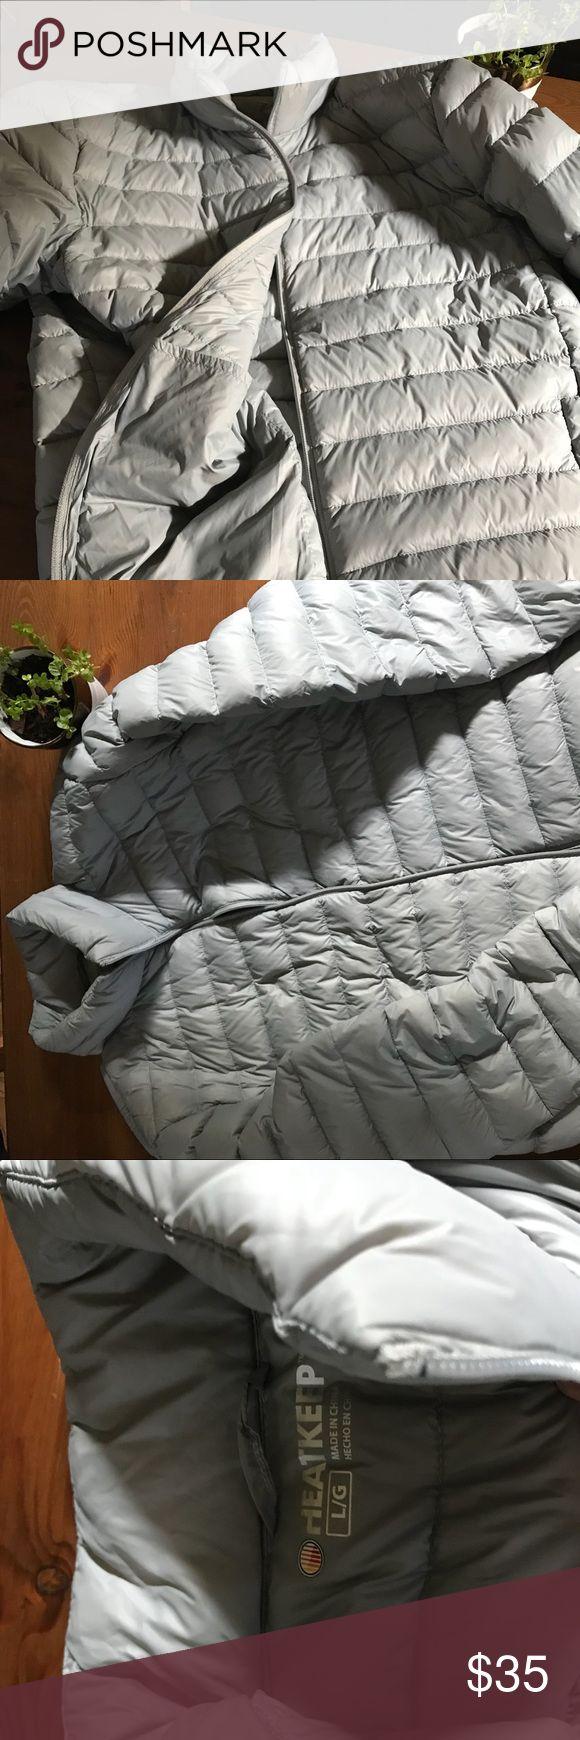 Men's HeatKeep Grey Puffer Jacket Great warm and stylish winter jacket, never been worn Jackets & Coats Puffers